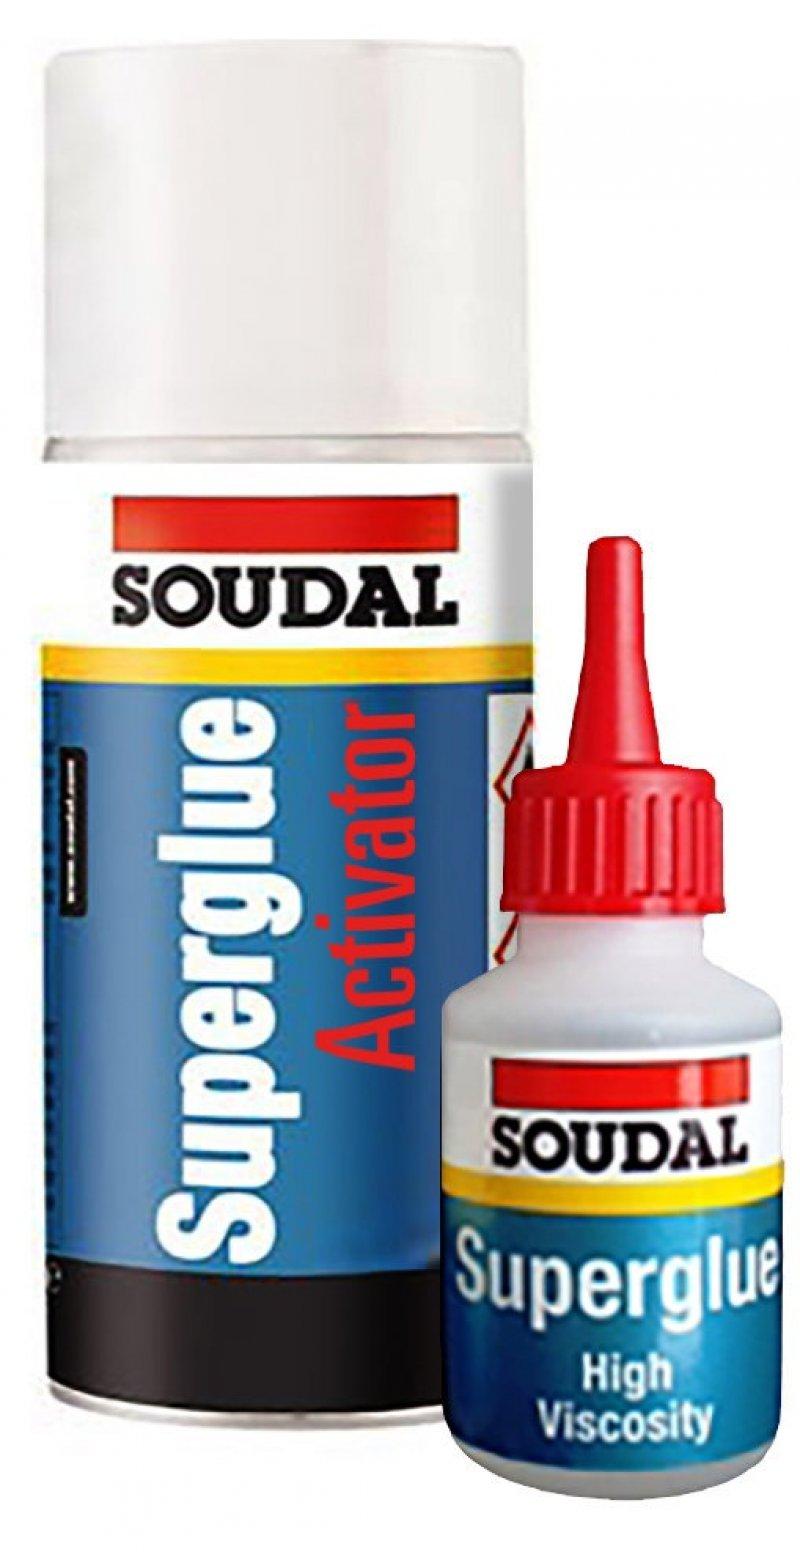 Soudal Clear Mitre-kit (2 sizes)